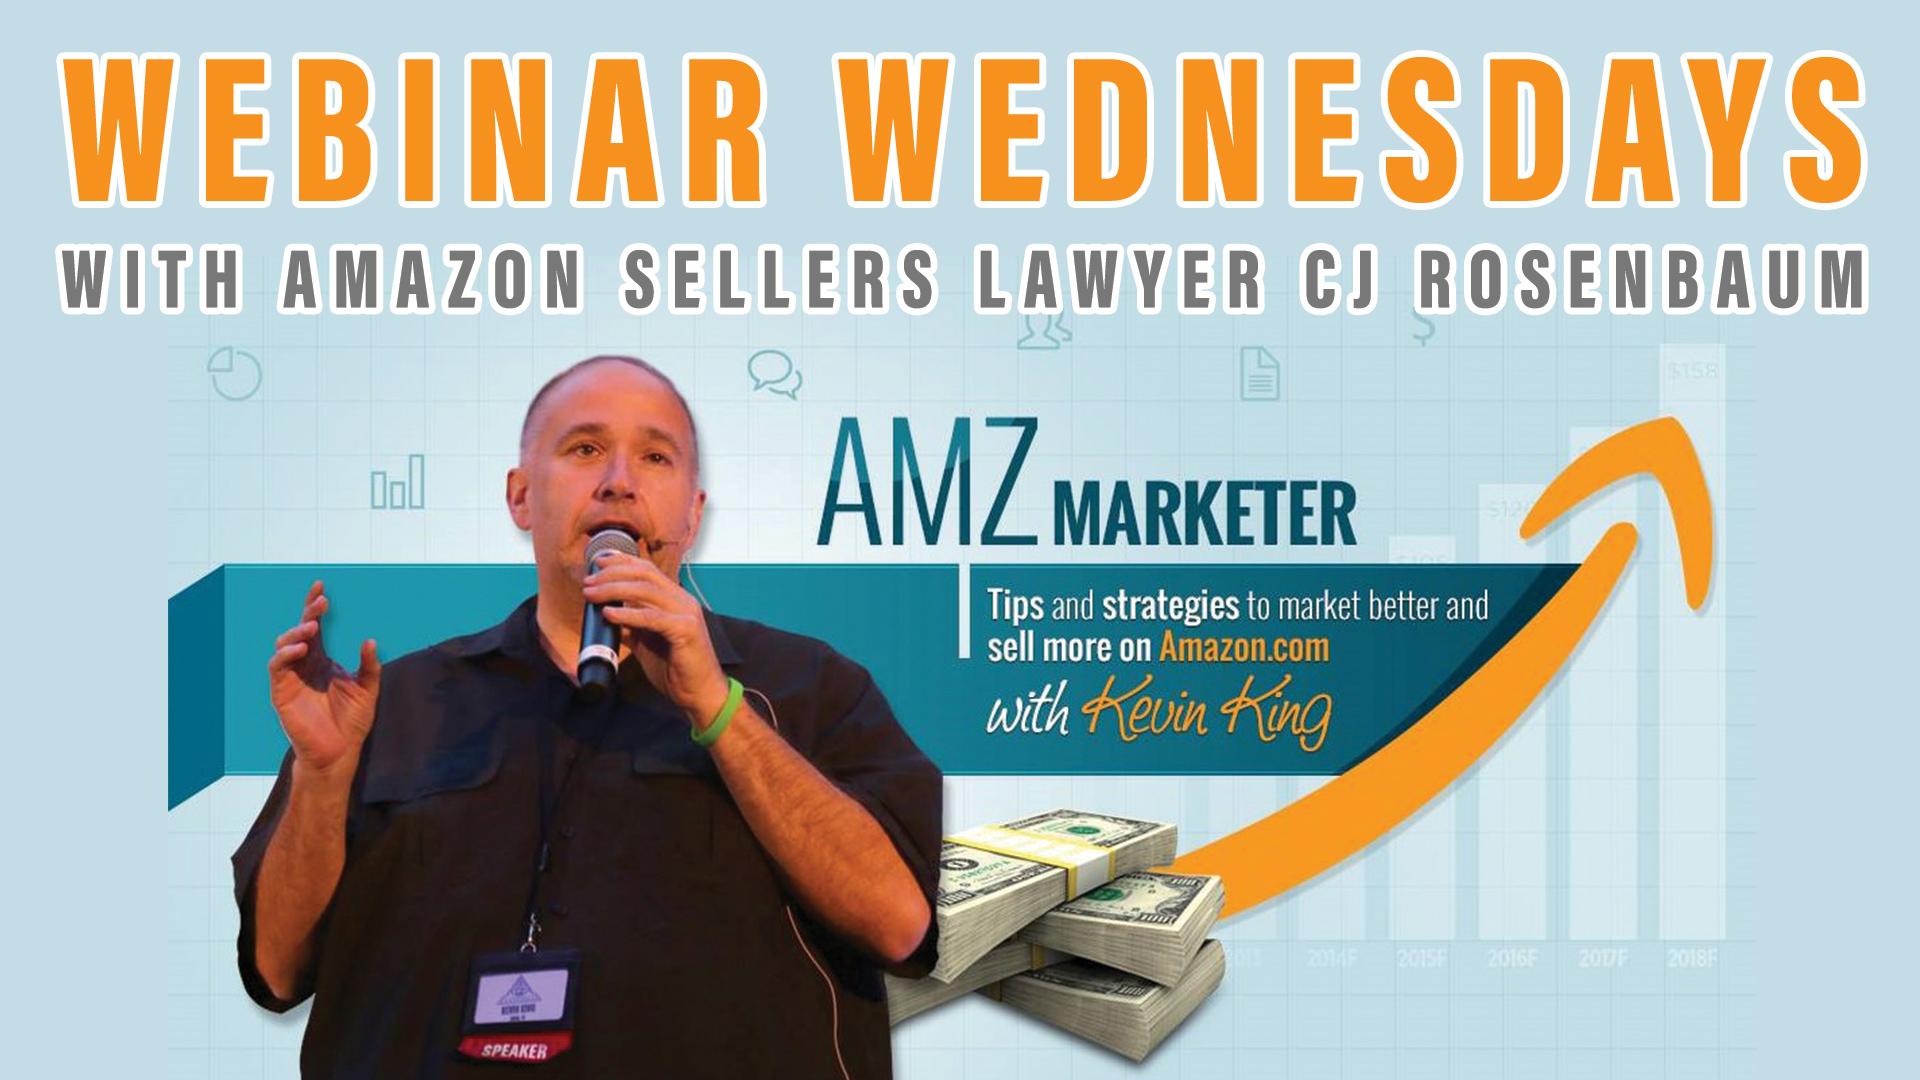 AMZ Marketer